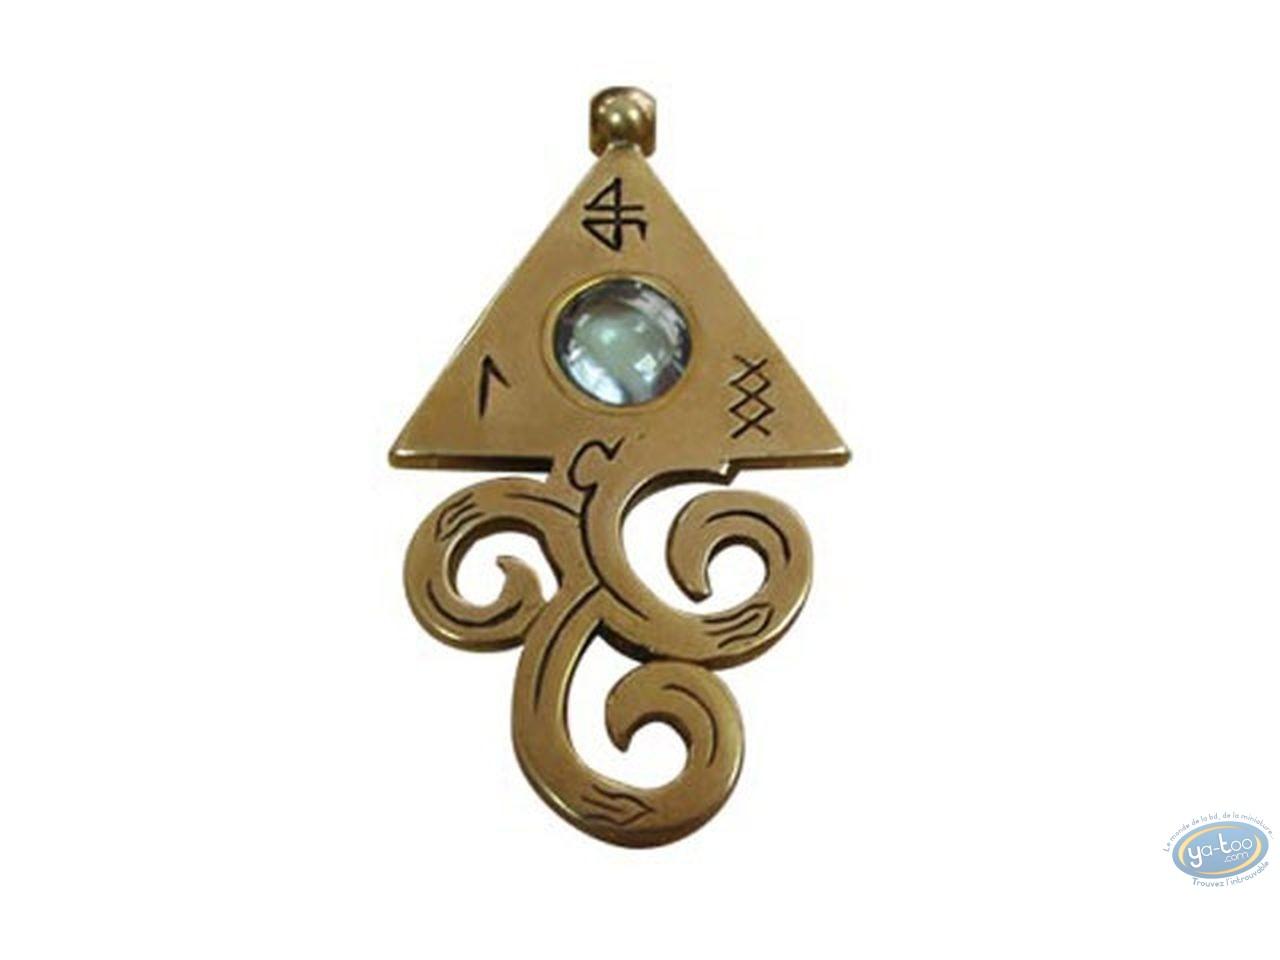 Jewelry, Tao Bang : Jewel, Cassegrain, Tao Bang : Pendant Kraken